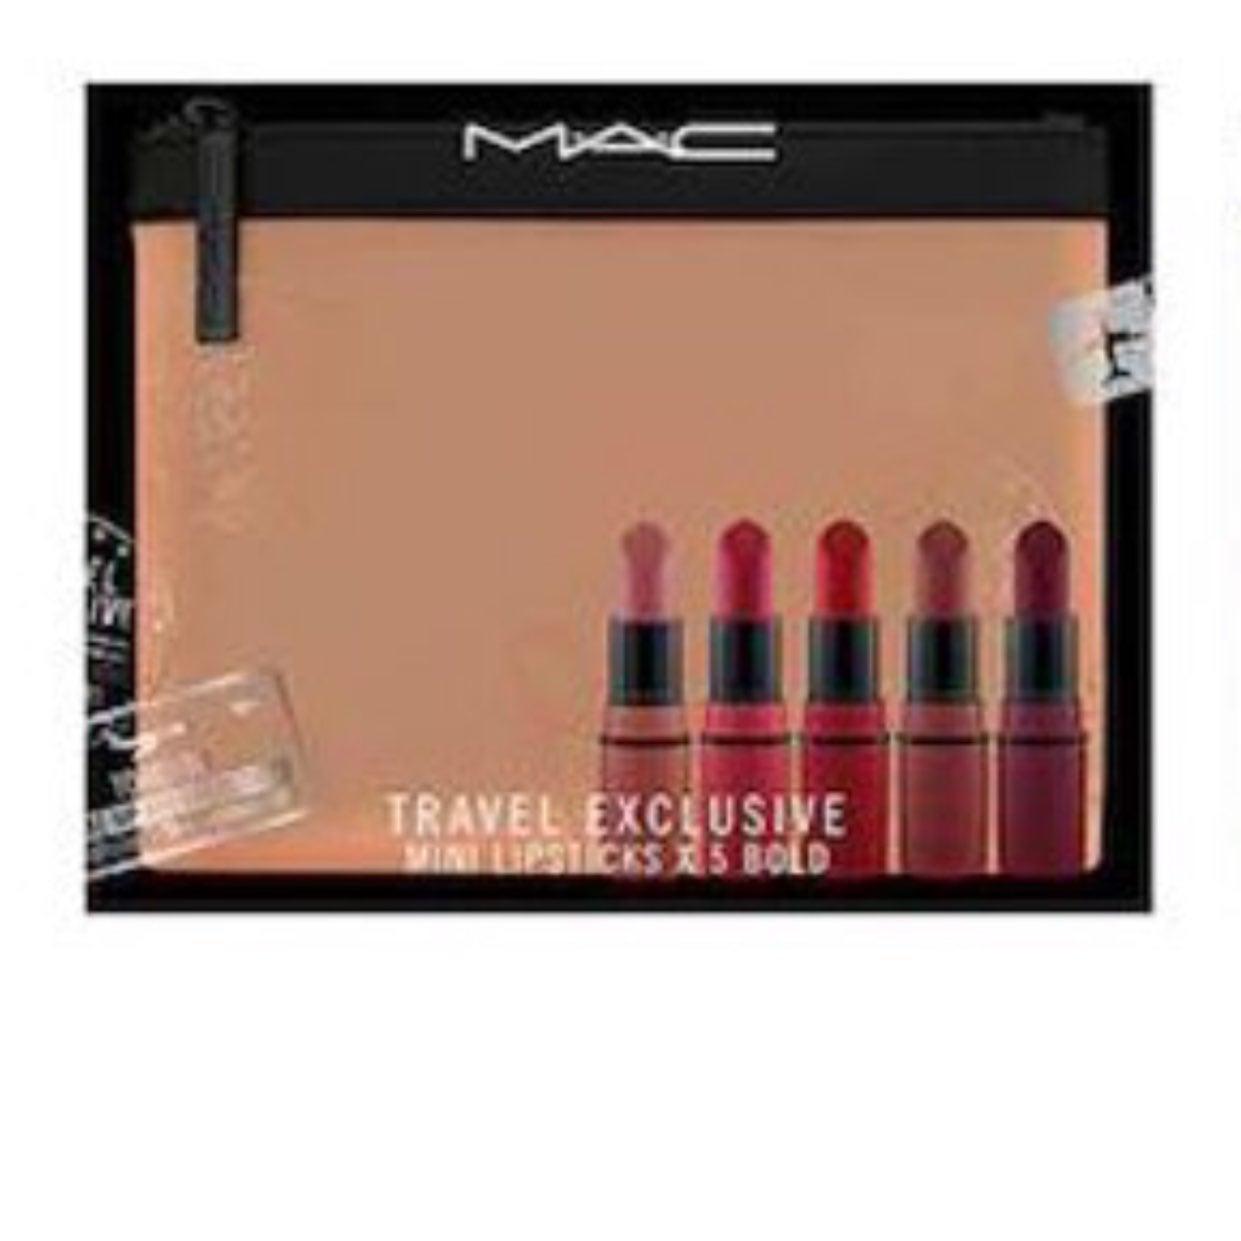 MAC travel exclusive mini lipsticks Bold